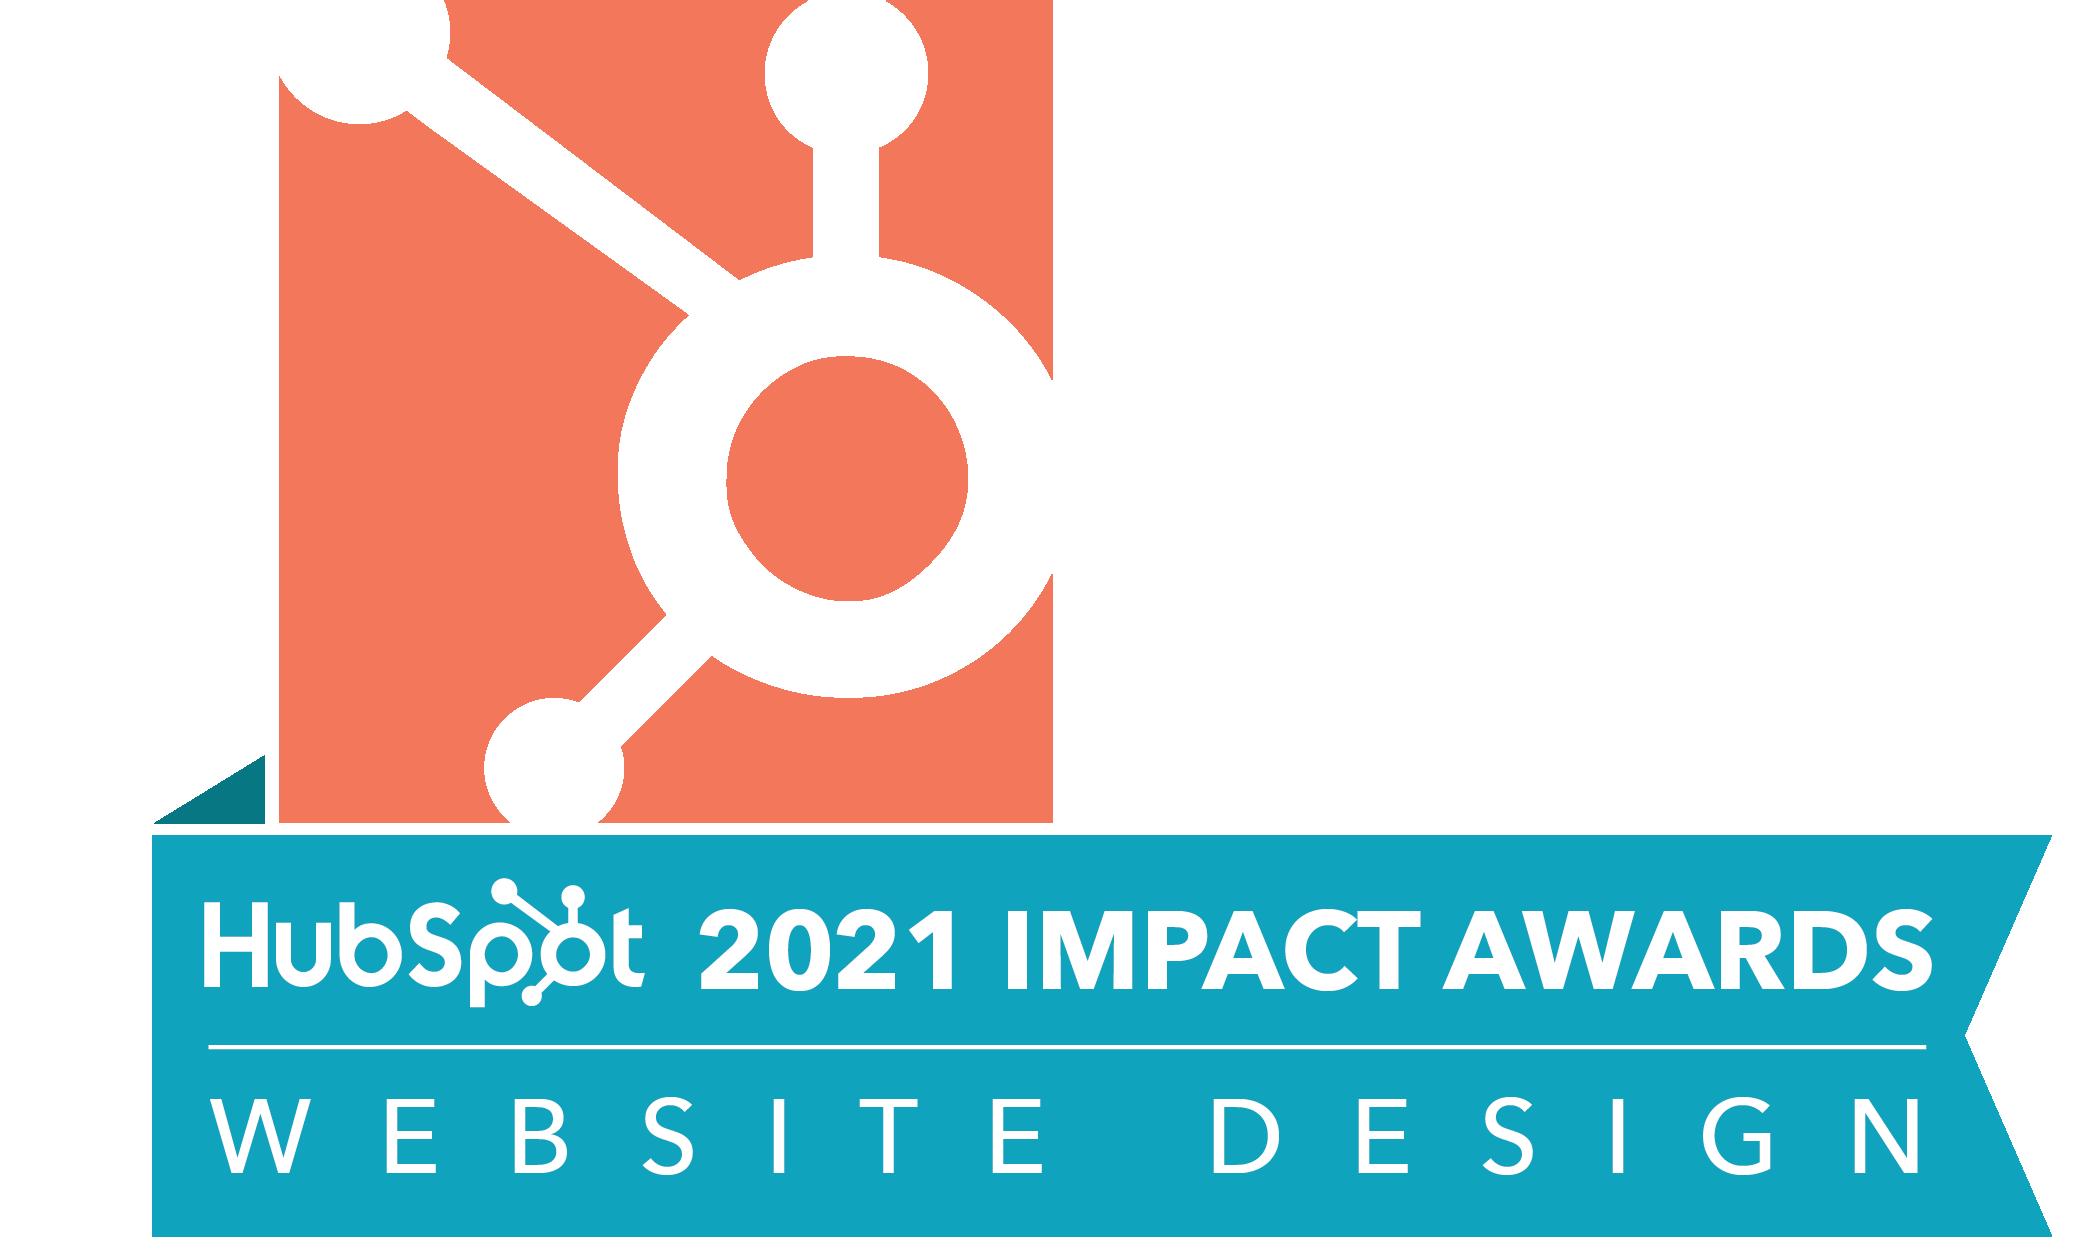 CRO:NYX Digital Awarded HubSpot Impact Award for Best Website in Latin America!